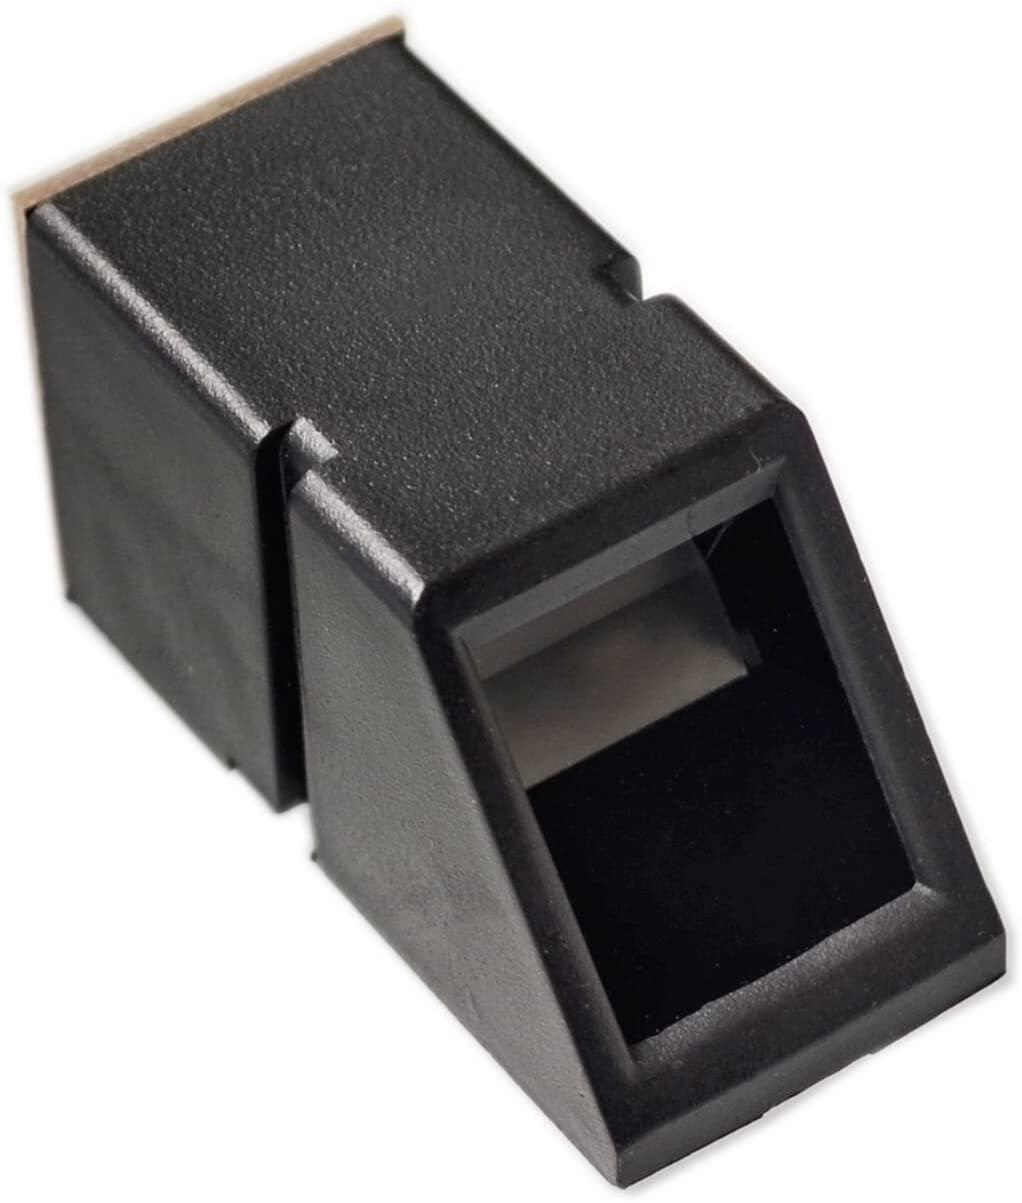 Bestol AS608 Optical fingerprint reader module sensor